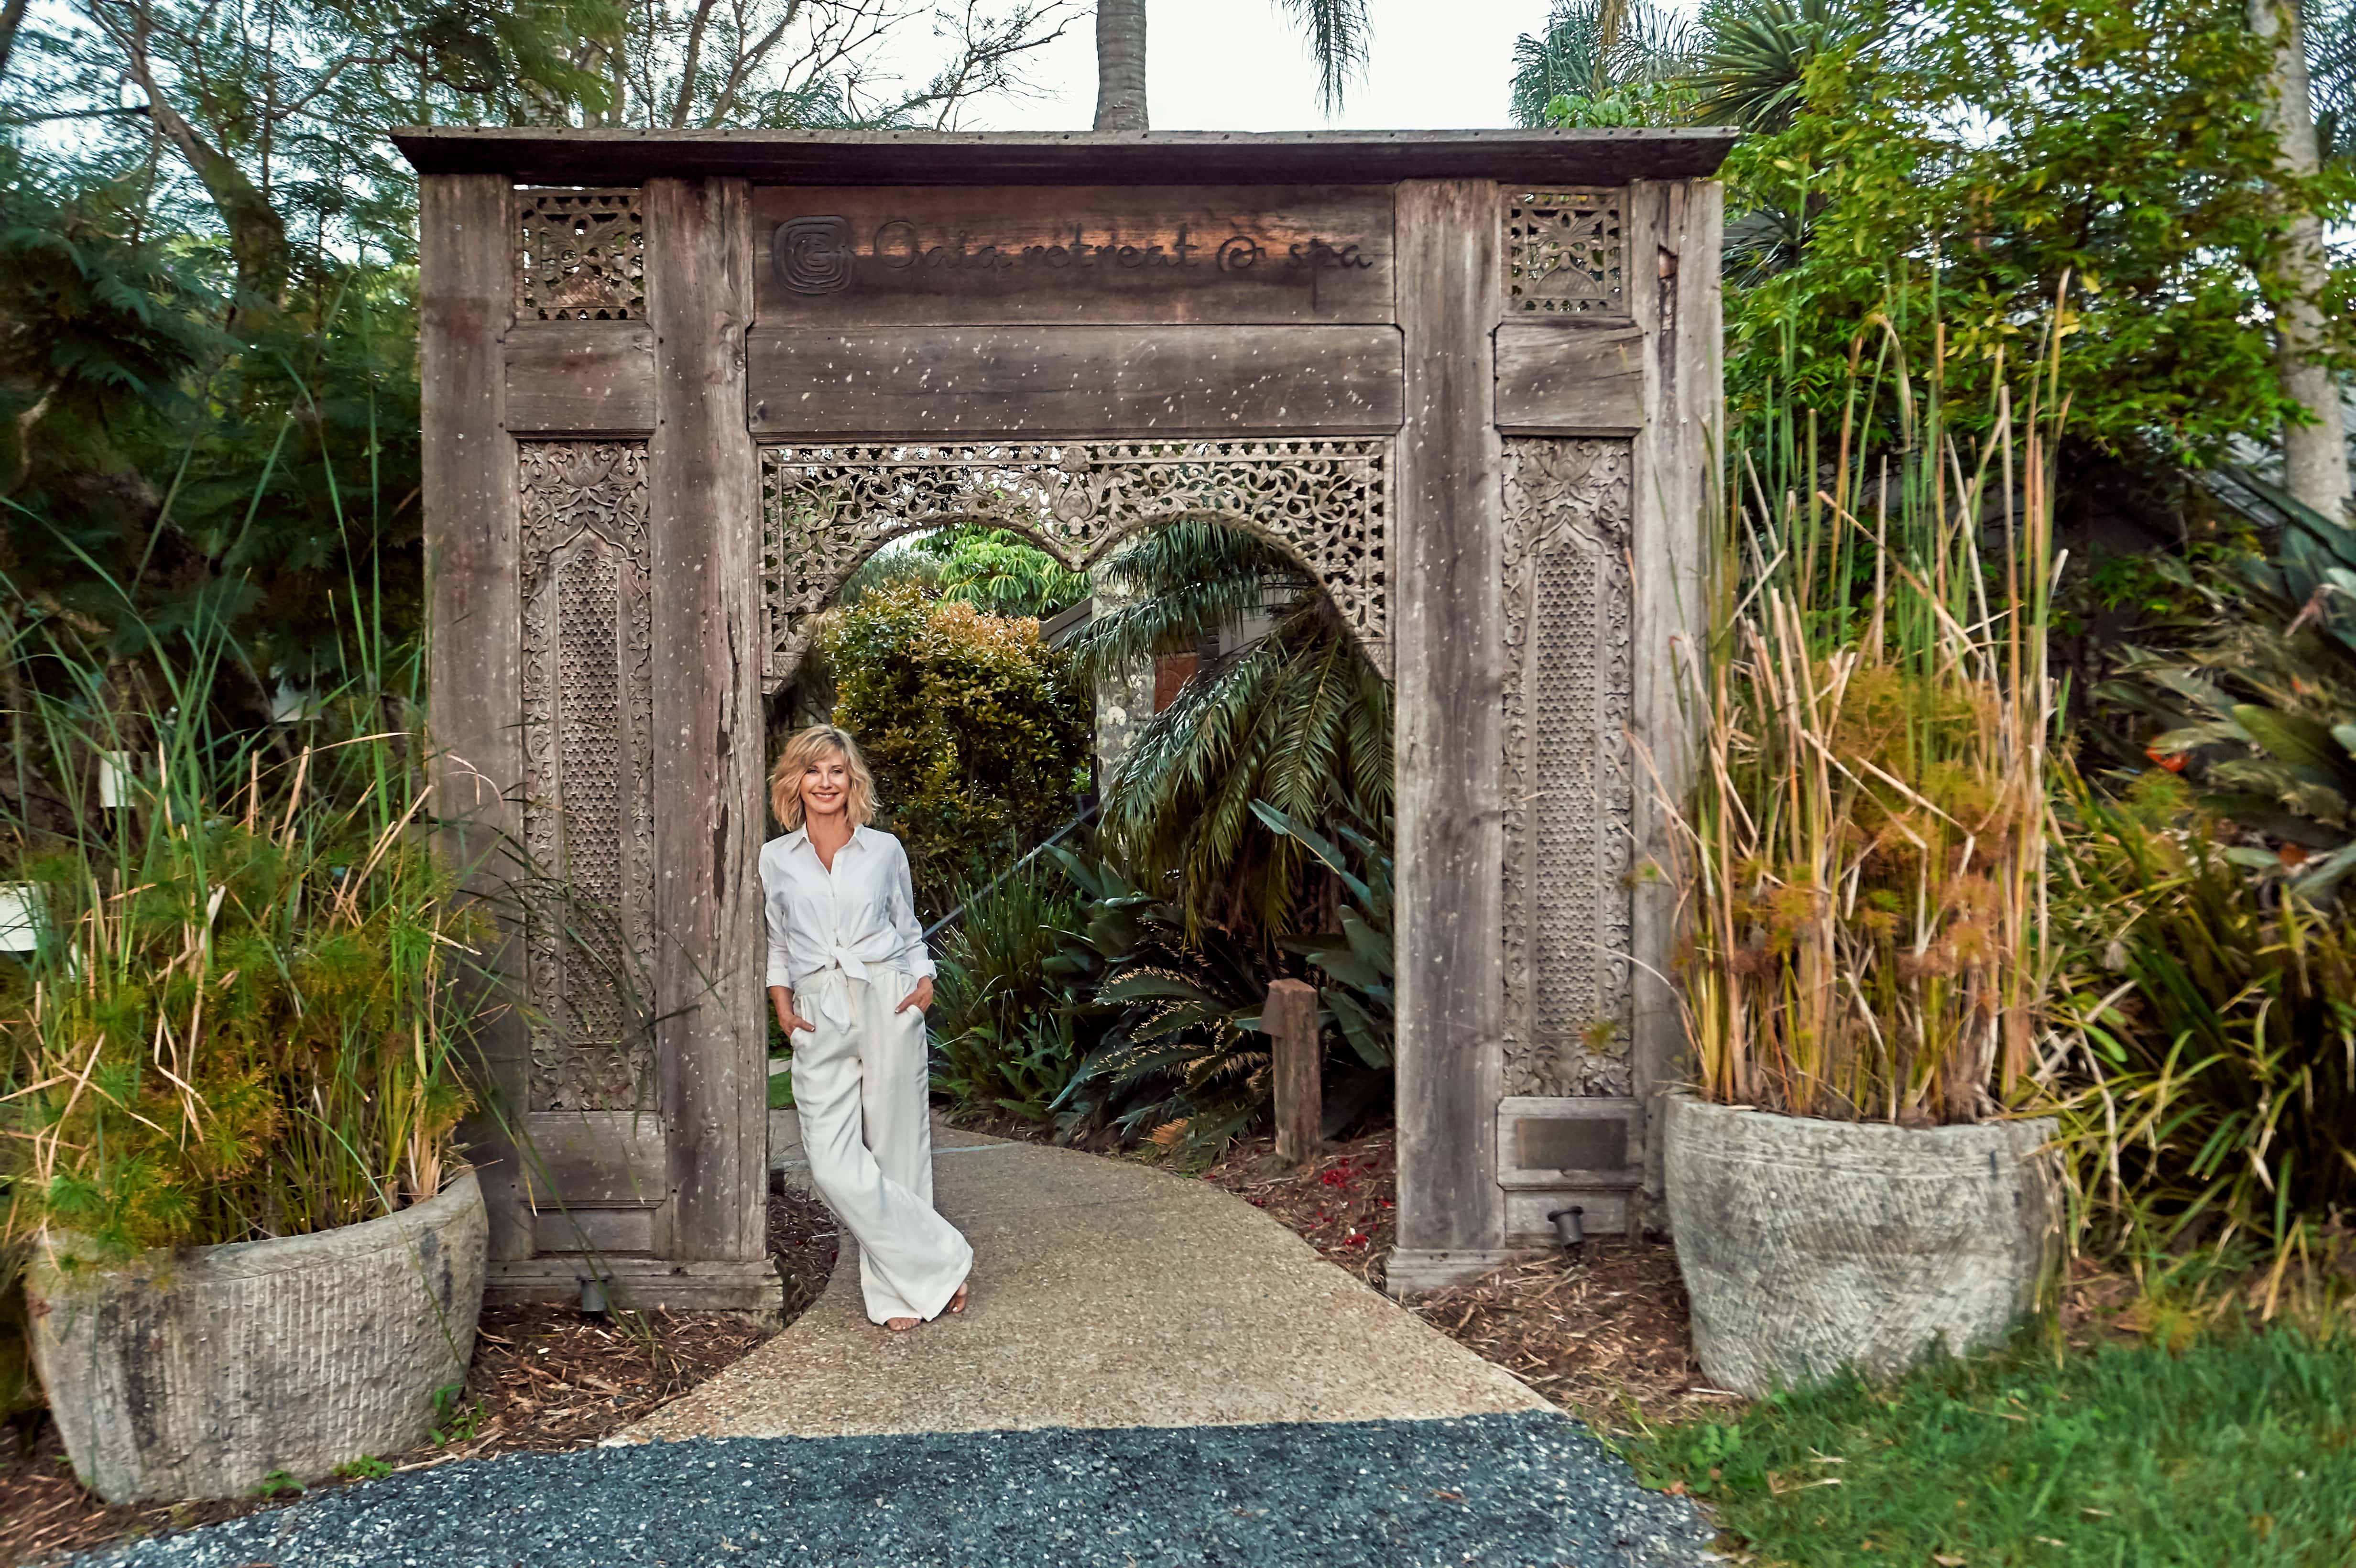 Retreatment Botanics Vegan And Cruelty Free Skincare By Olivia Newton John